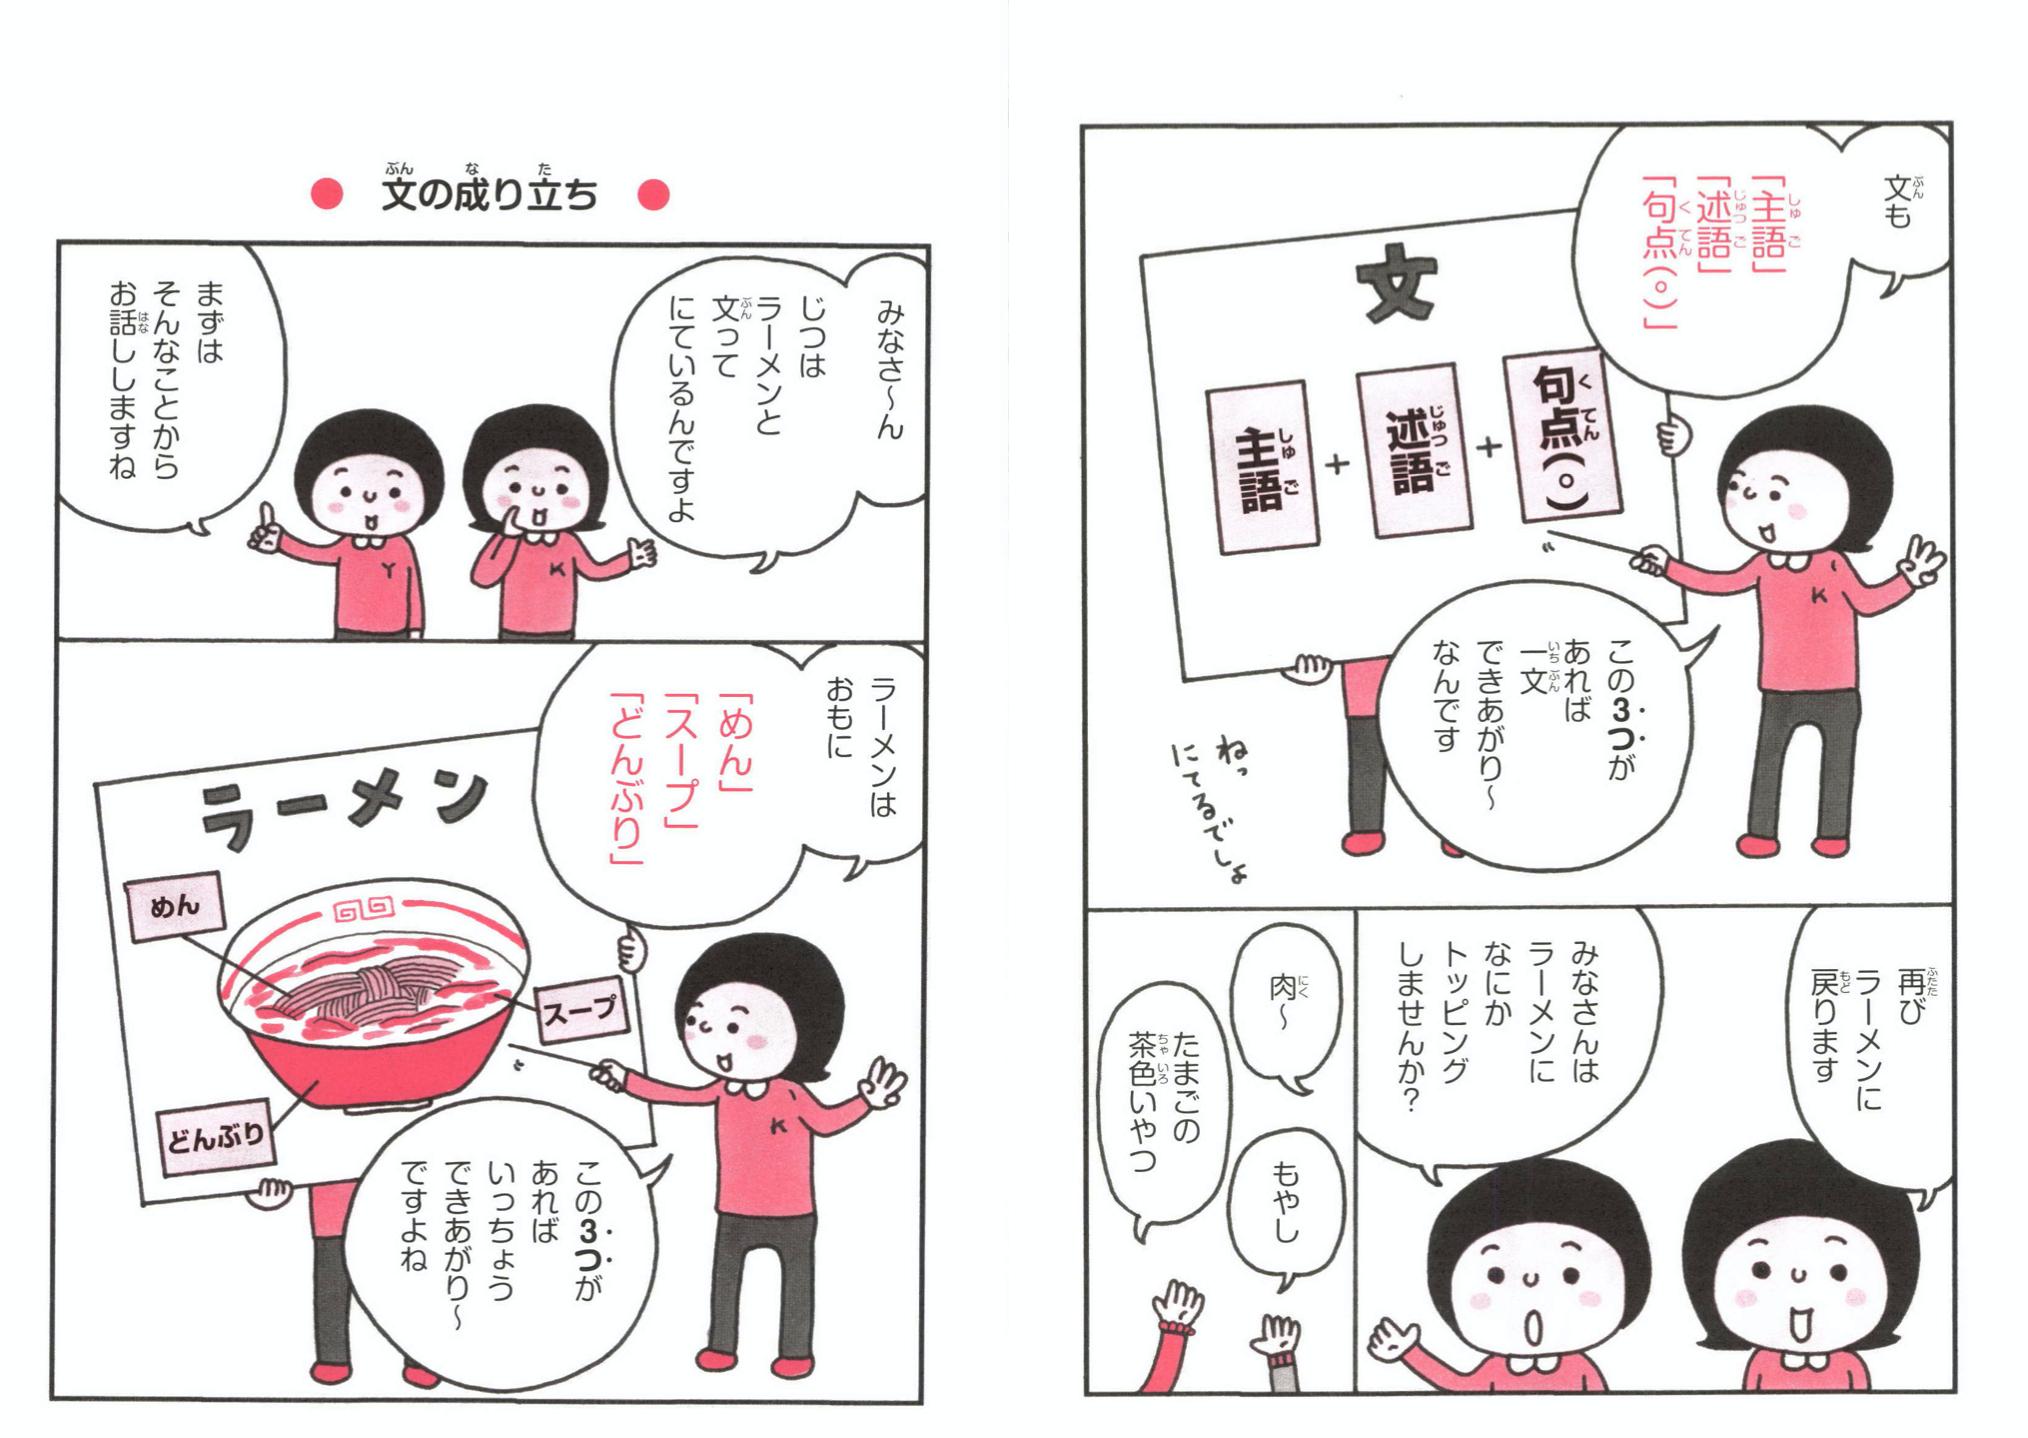 manga kakitakunaru sakubunkyoshitu sample